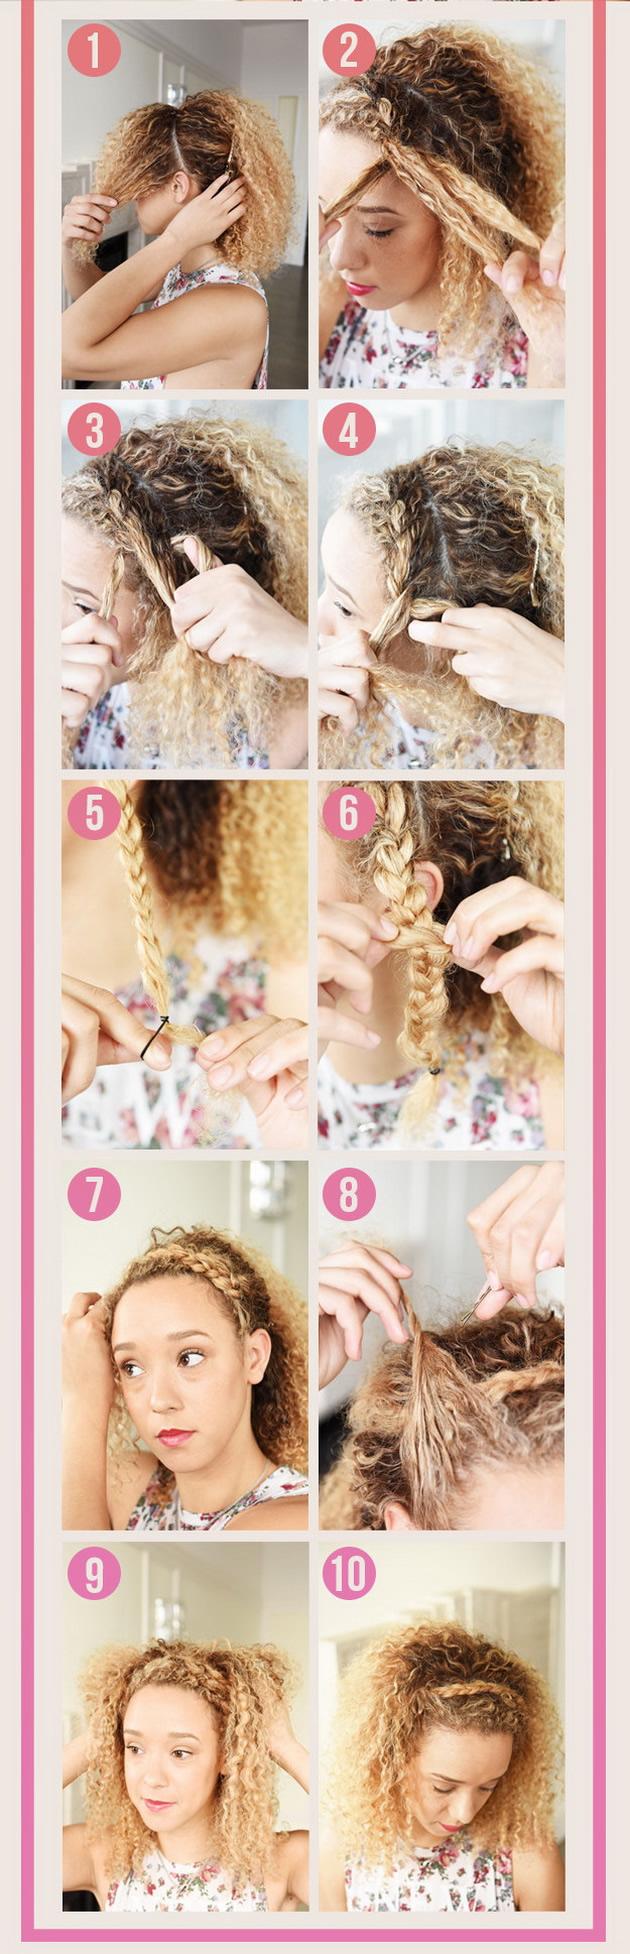 12-frizuri-za-devojkite-so-prirodno-vitkana-kosa-gotovi-za-5-minuti-7.jpg